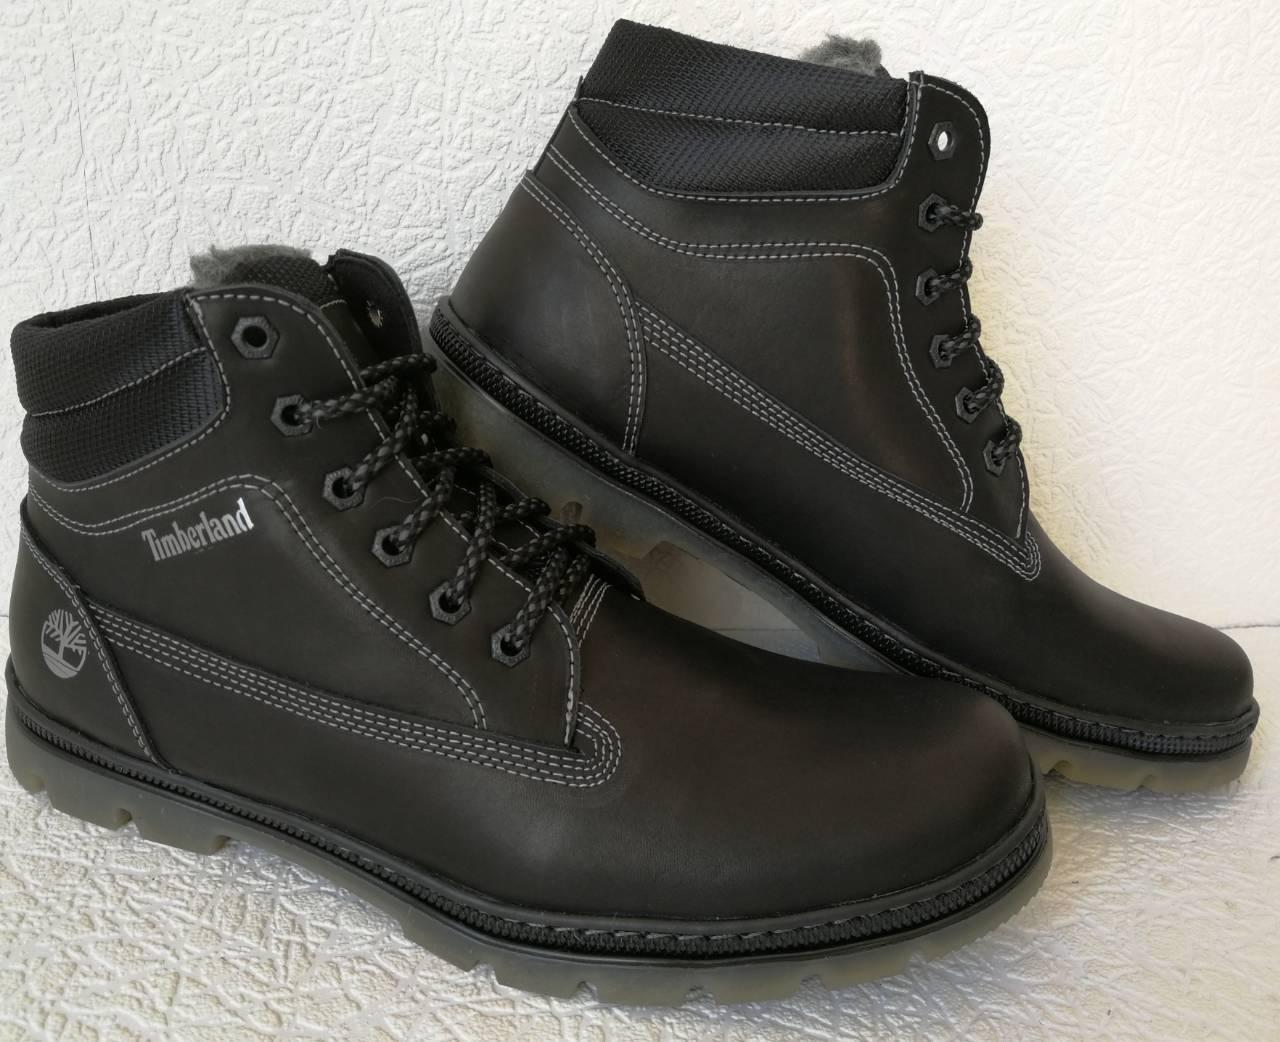 Timberland зимние ботинки большого размера мужская обувь сапоги гигант  батал. - Trendy-brendy. c3f2390d7d2f7